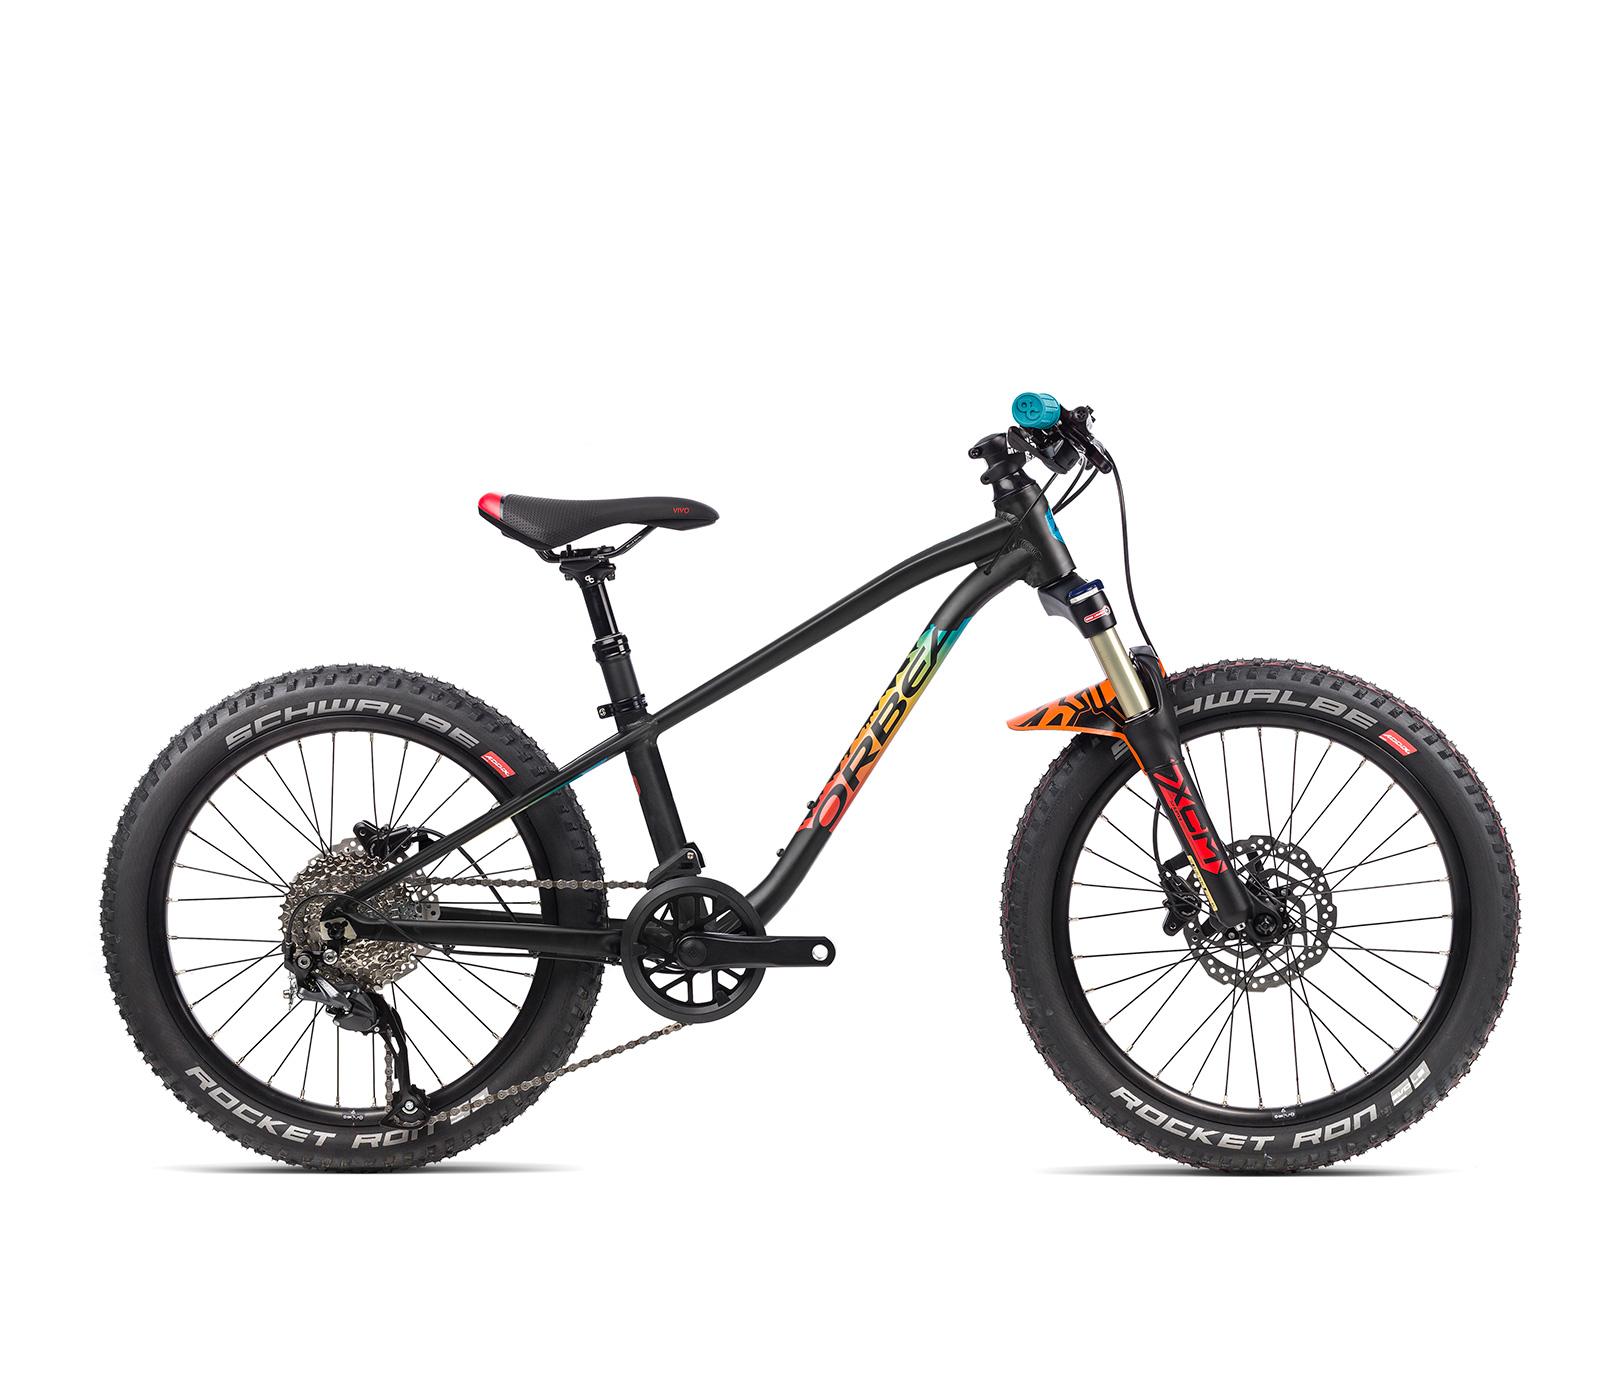 Image of Orbea Laufey H20 20in Wheel Kids Mountain Bike 2021 Black/Rainbow